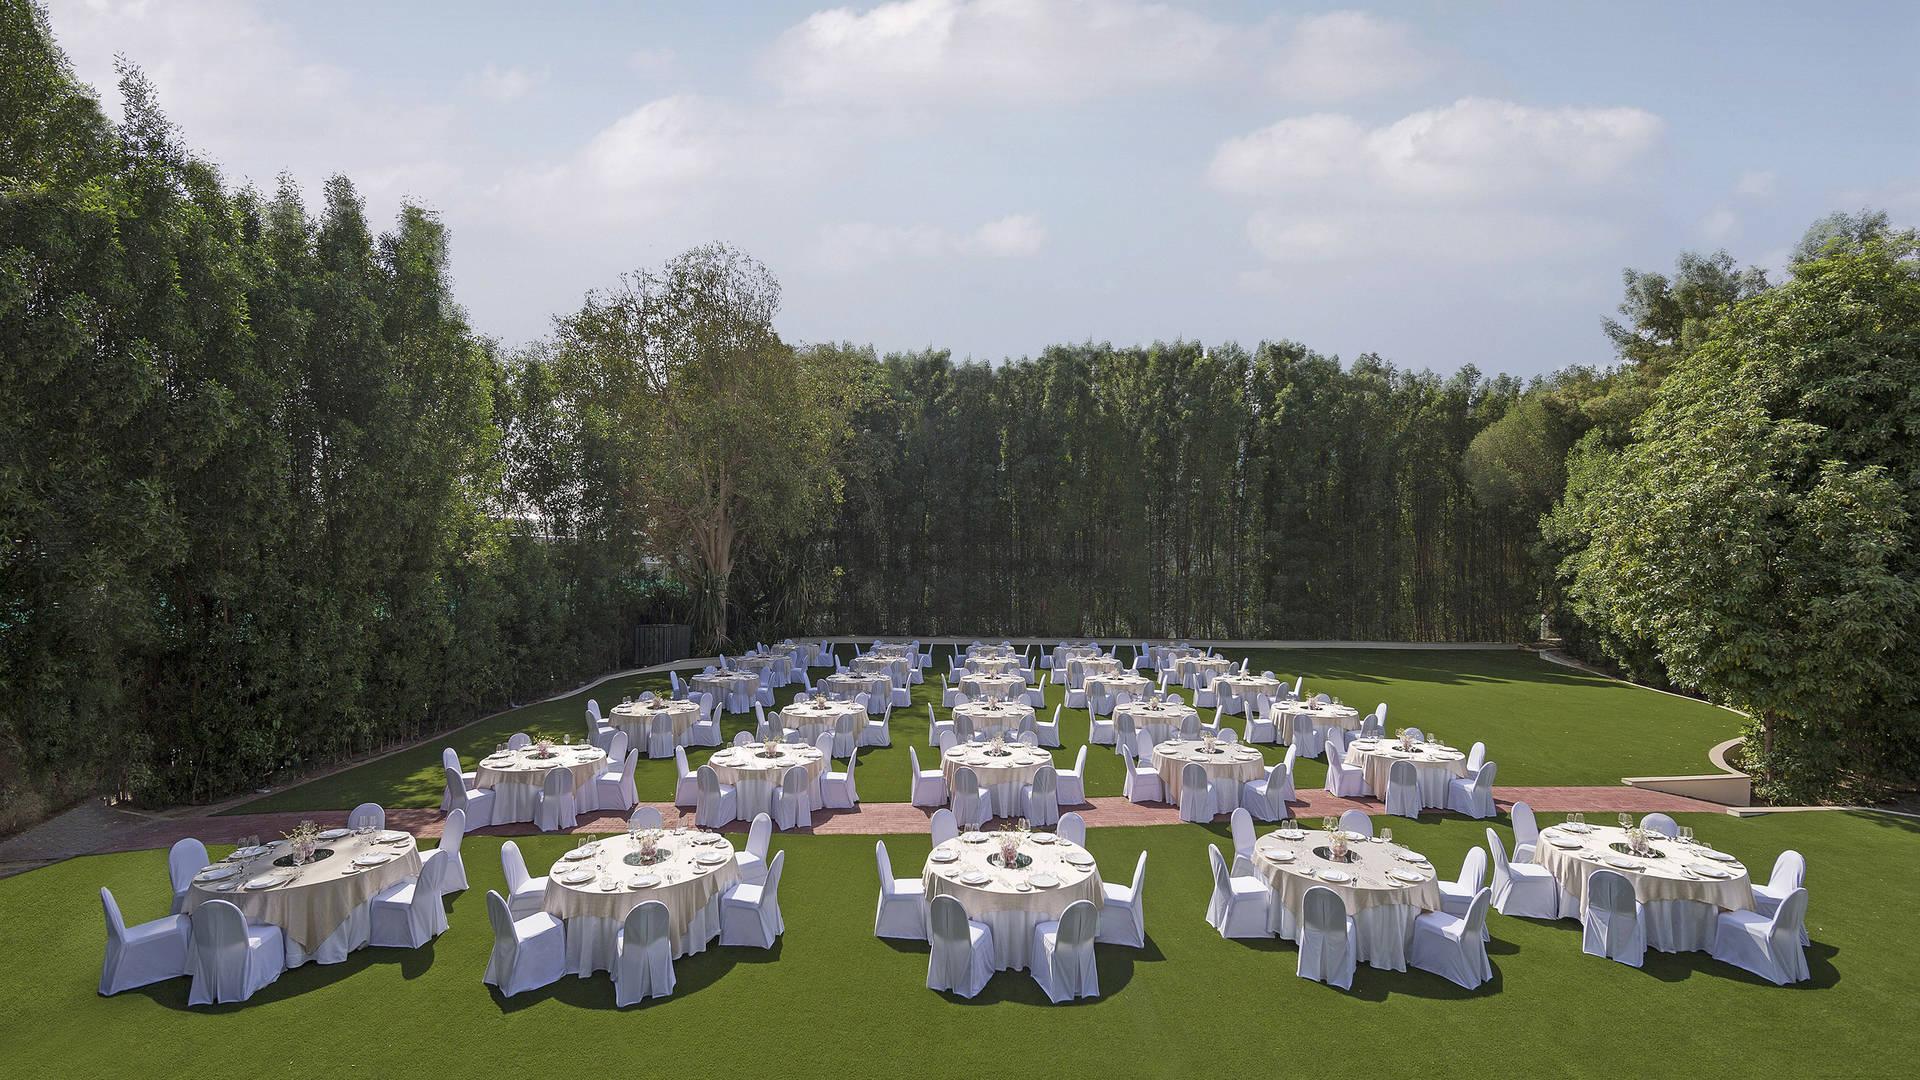 https://cdn.jumeirah.com/-/mediadh/DH/Hospitality/Jumeirah/Occasion/Dubai/Creekside-Hotel/Creekside-Hotel-Gardens/Jumeirah-Creekside-Hotel-The-Gardens-Dinner-Set-Up16-9.jpg?h=1080&w=1920&hash=2E1B68098552028E735BA8FAFBEA712F